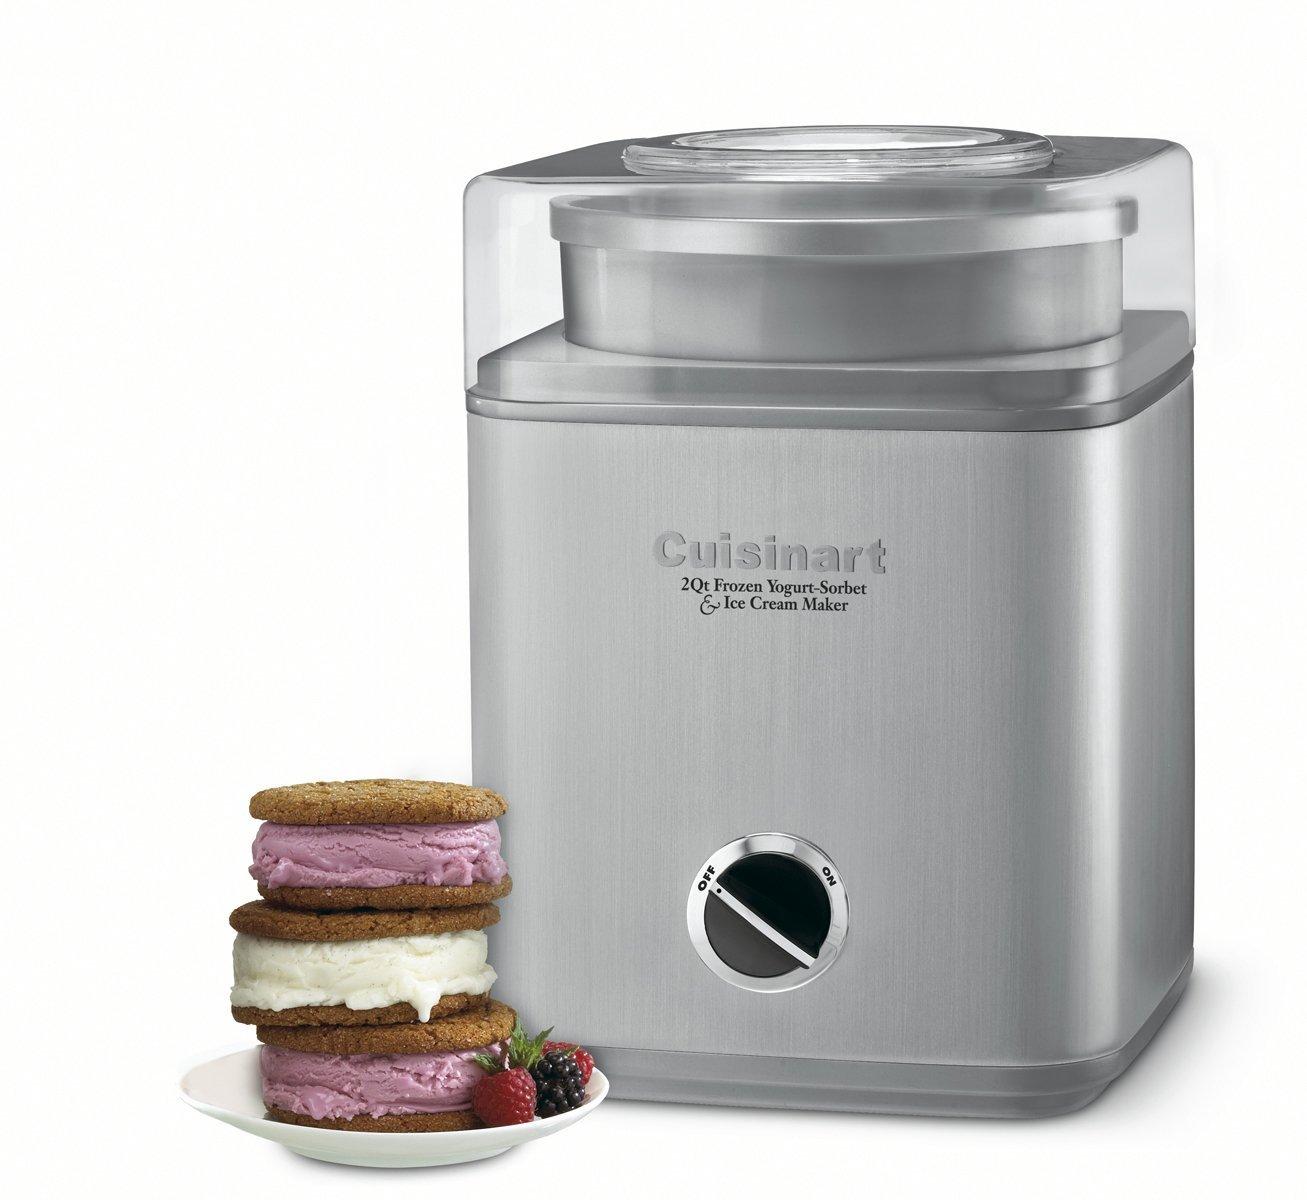 Cuisinart Pure Indulgence 2-Quart Automatic Frozen Yogurt, Sorbet, and Ice Cream Maker